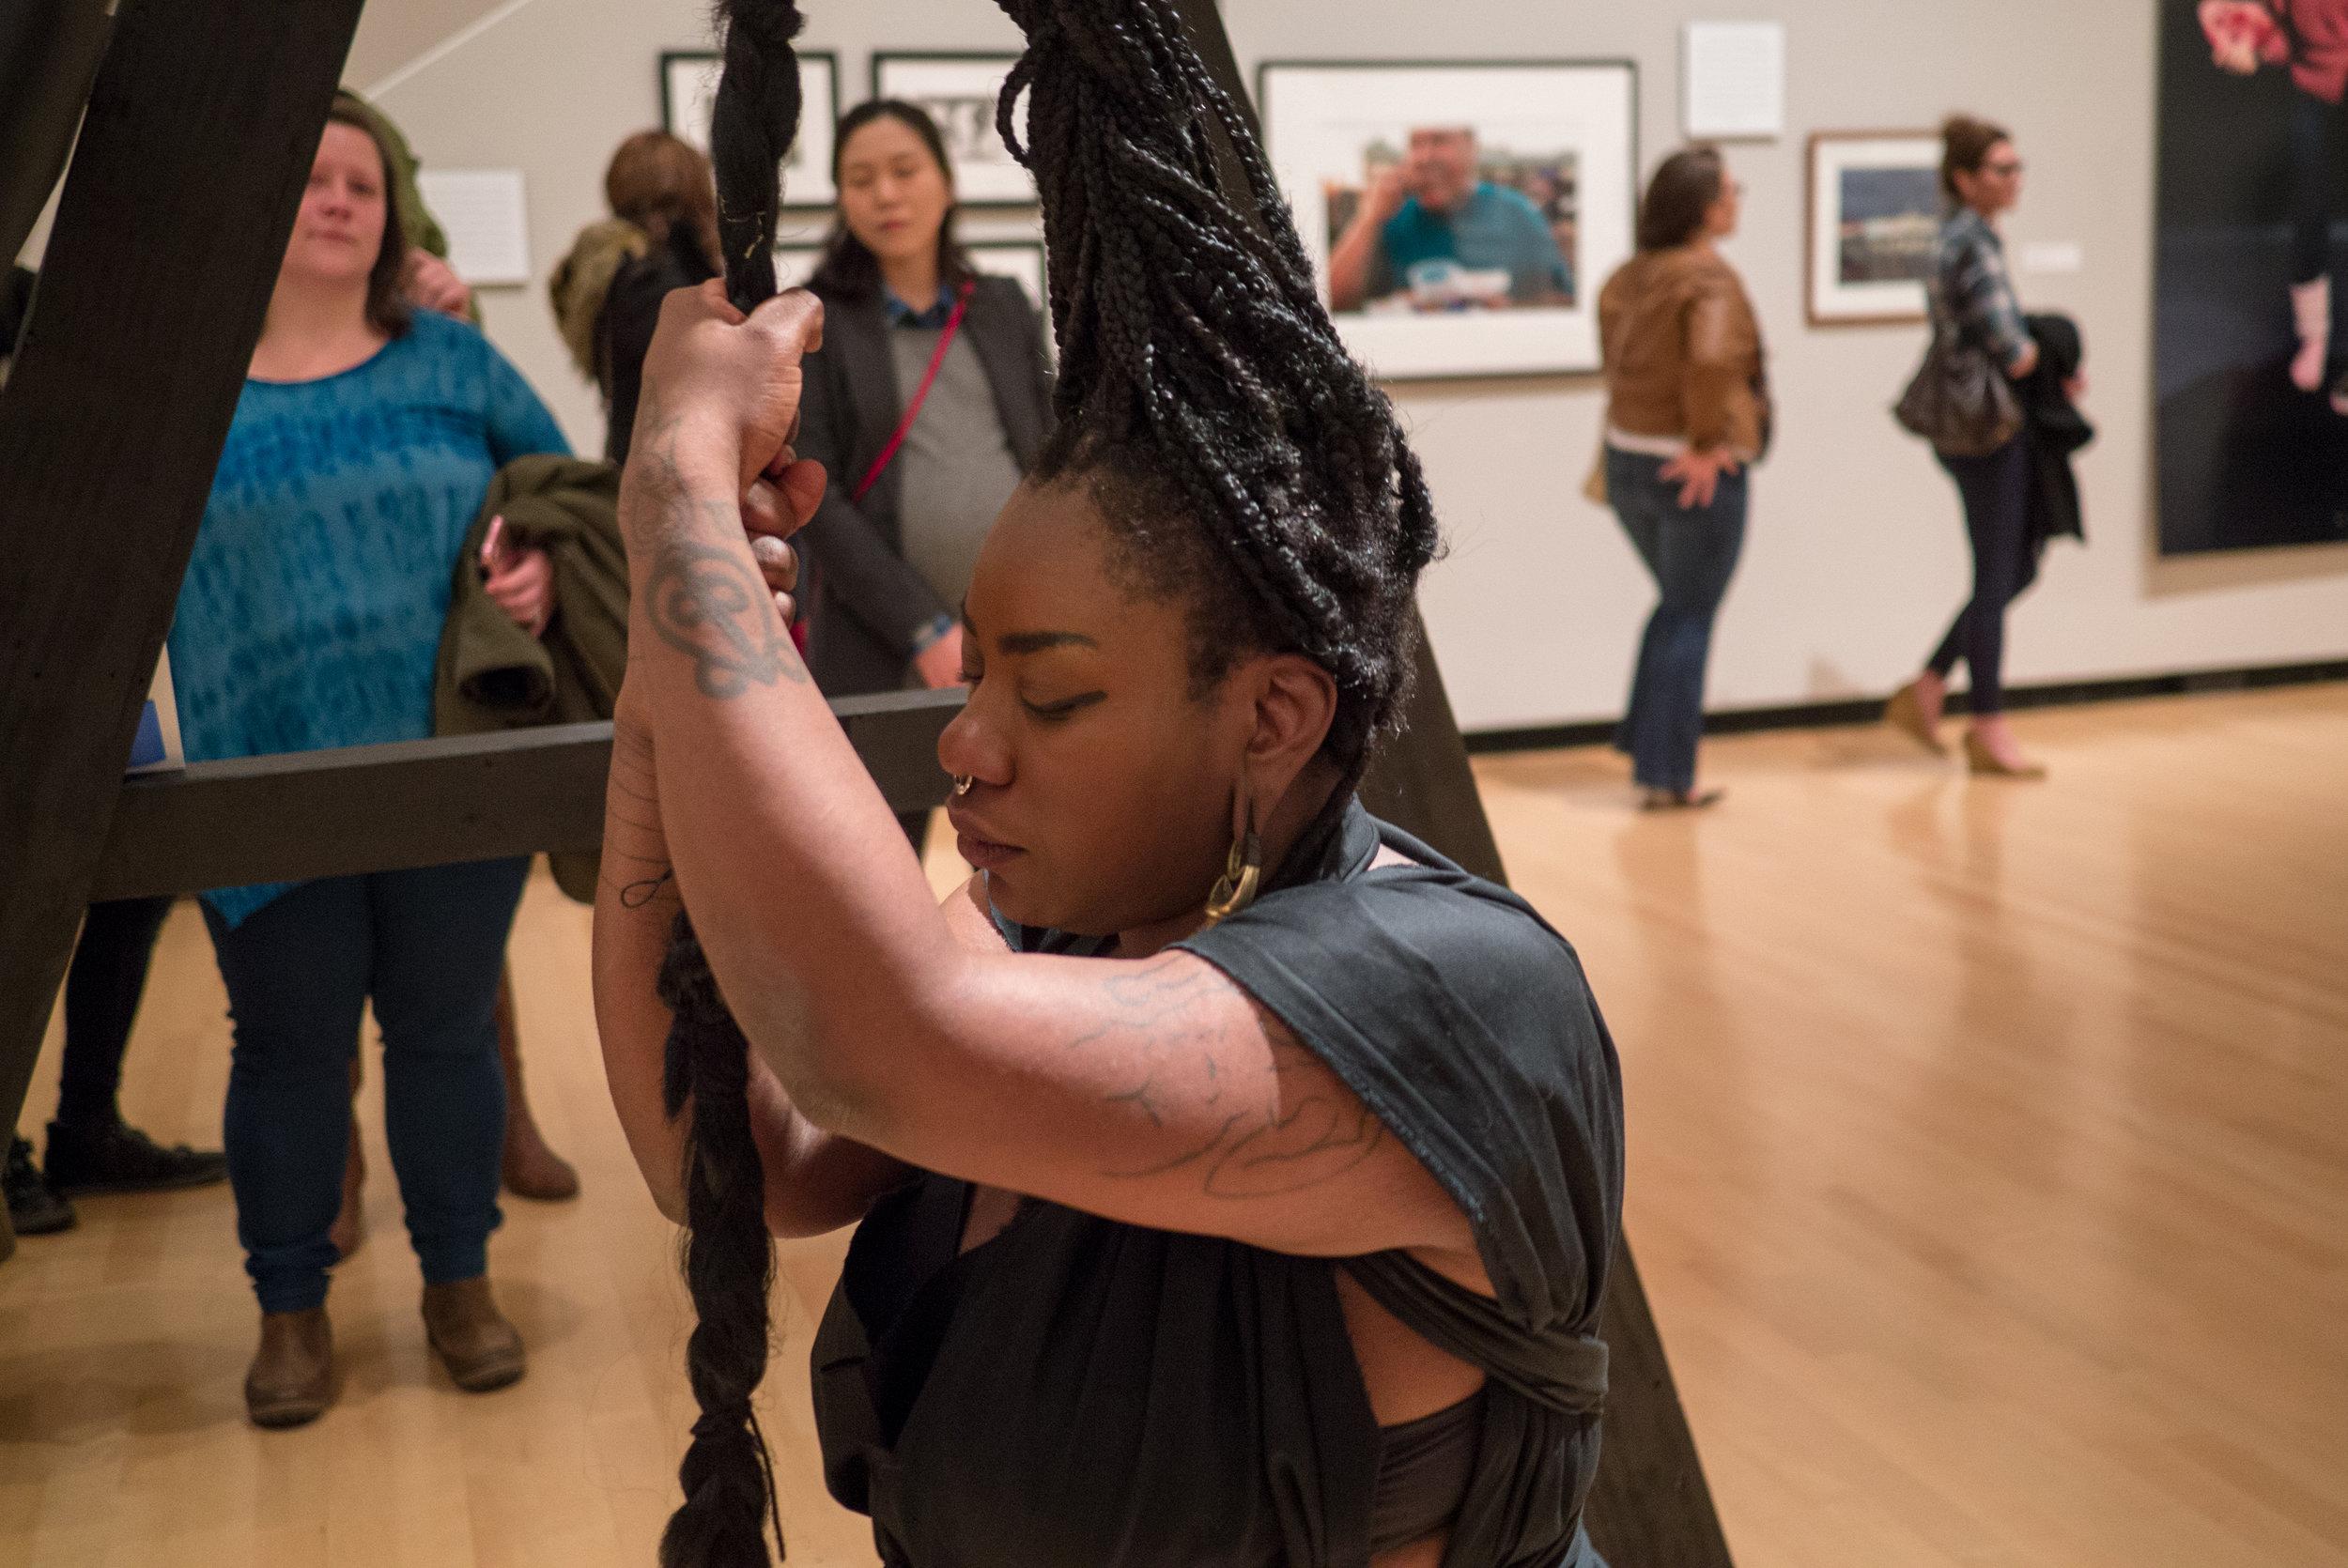 Powerful black woman holding braid in art performance